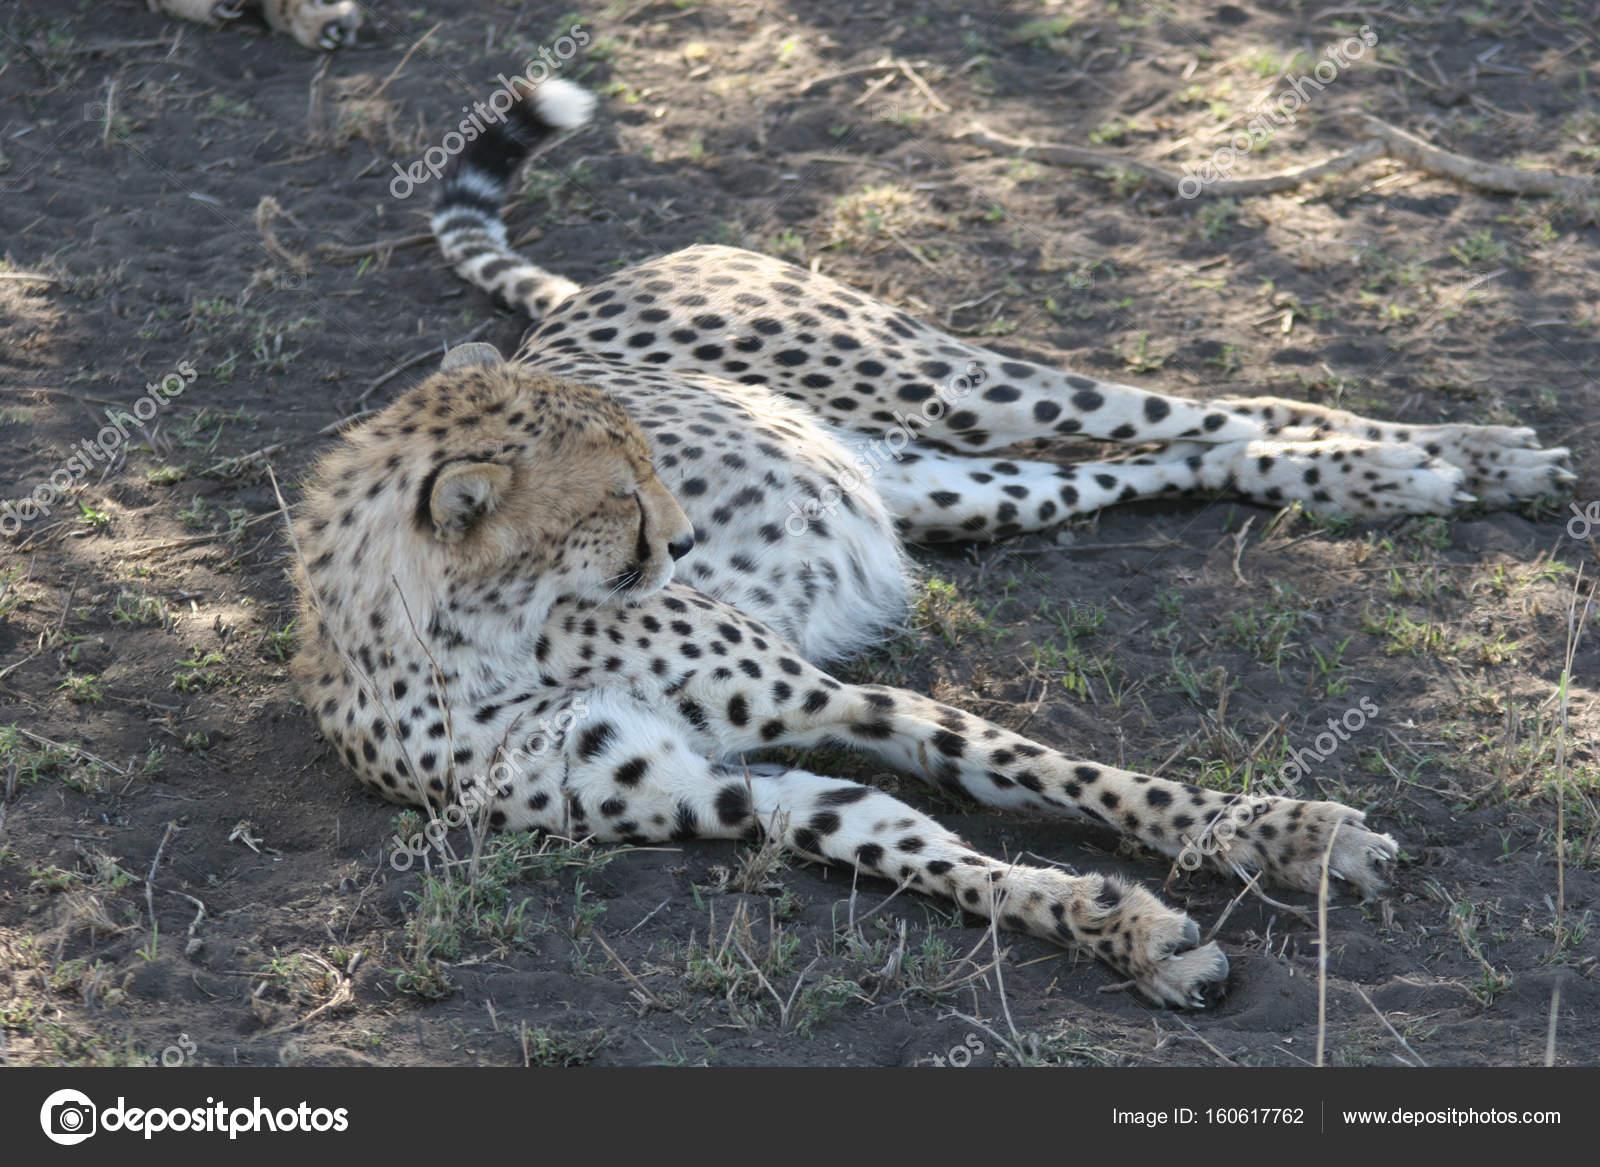 Mammifères Animaux Sauvages De La Savane Afrique Botswana intérieur Animaux Sauvages De L Afrique